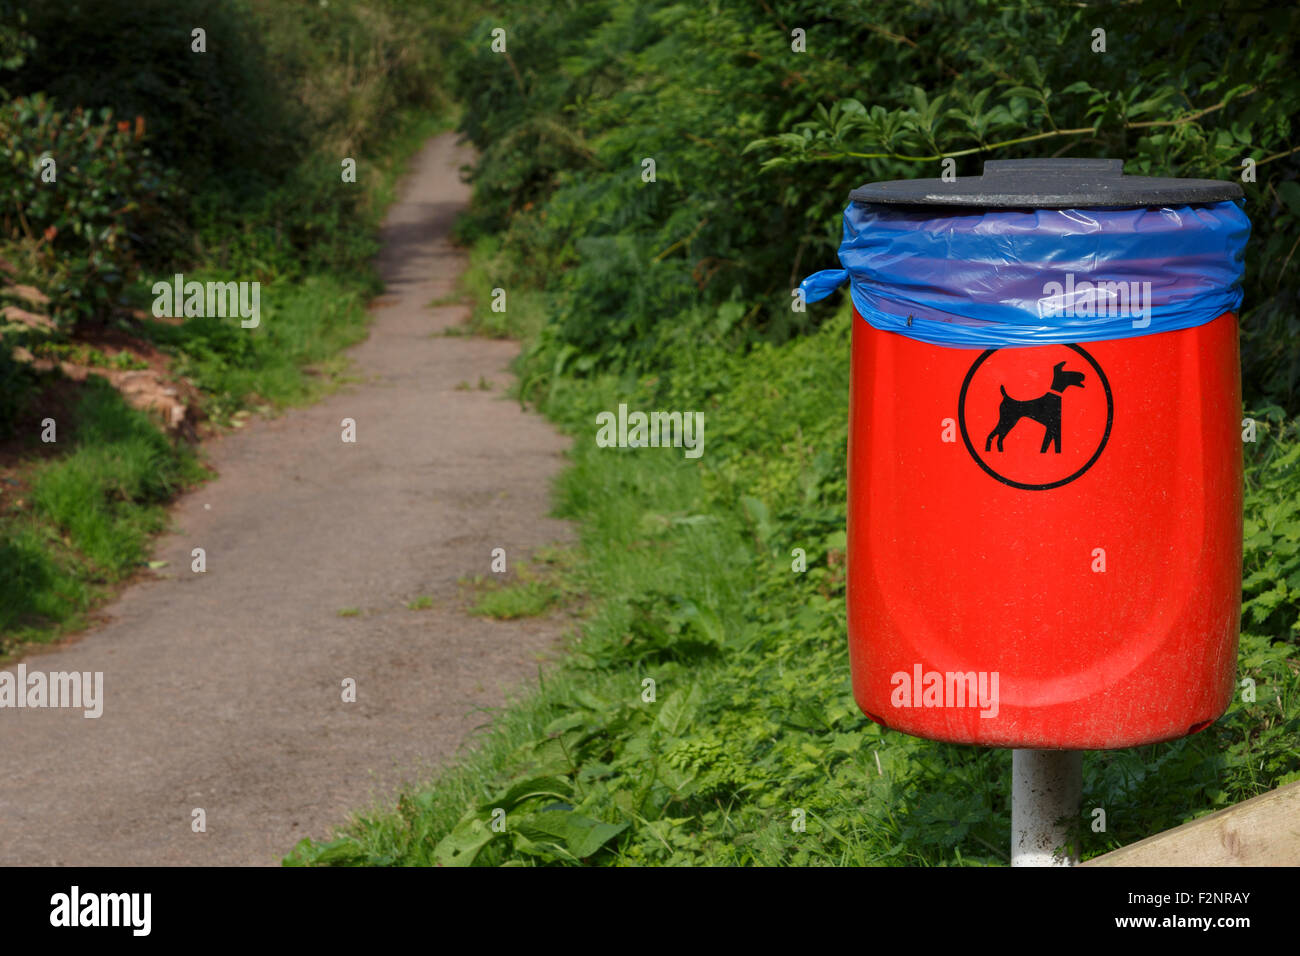 Dog poo bin on footpath. Stock Photo